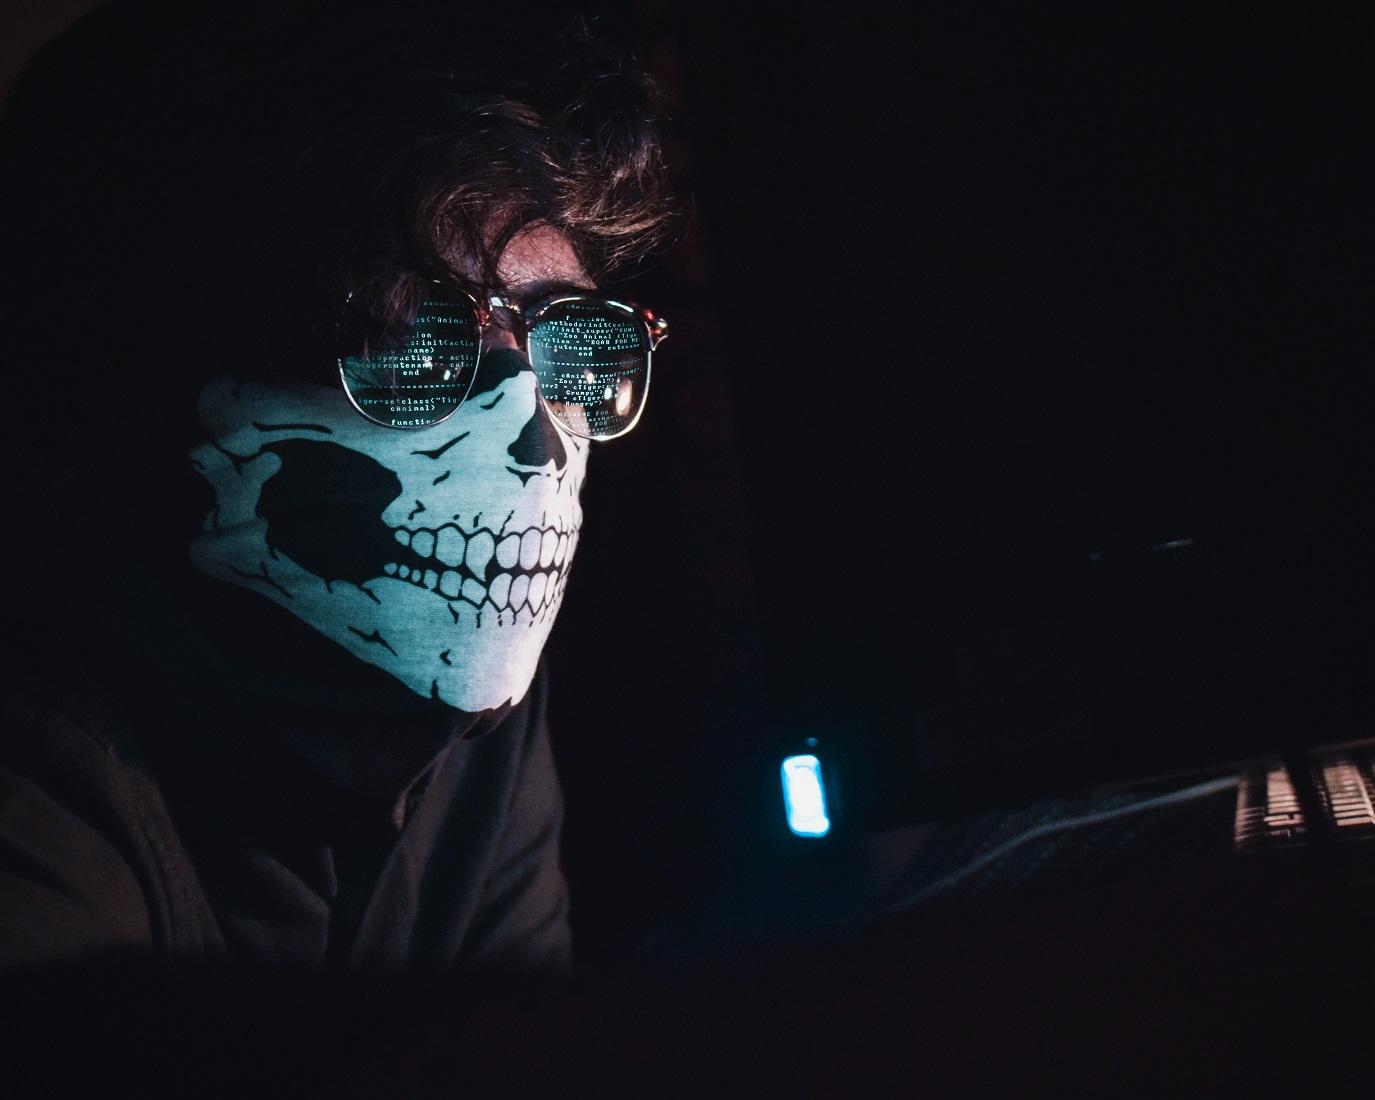 DarkSide - cybercriminals